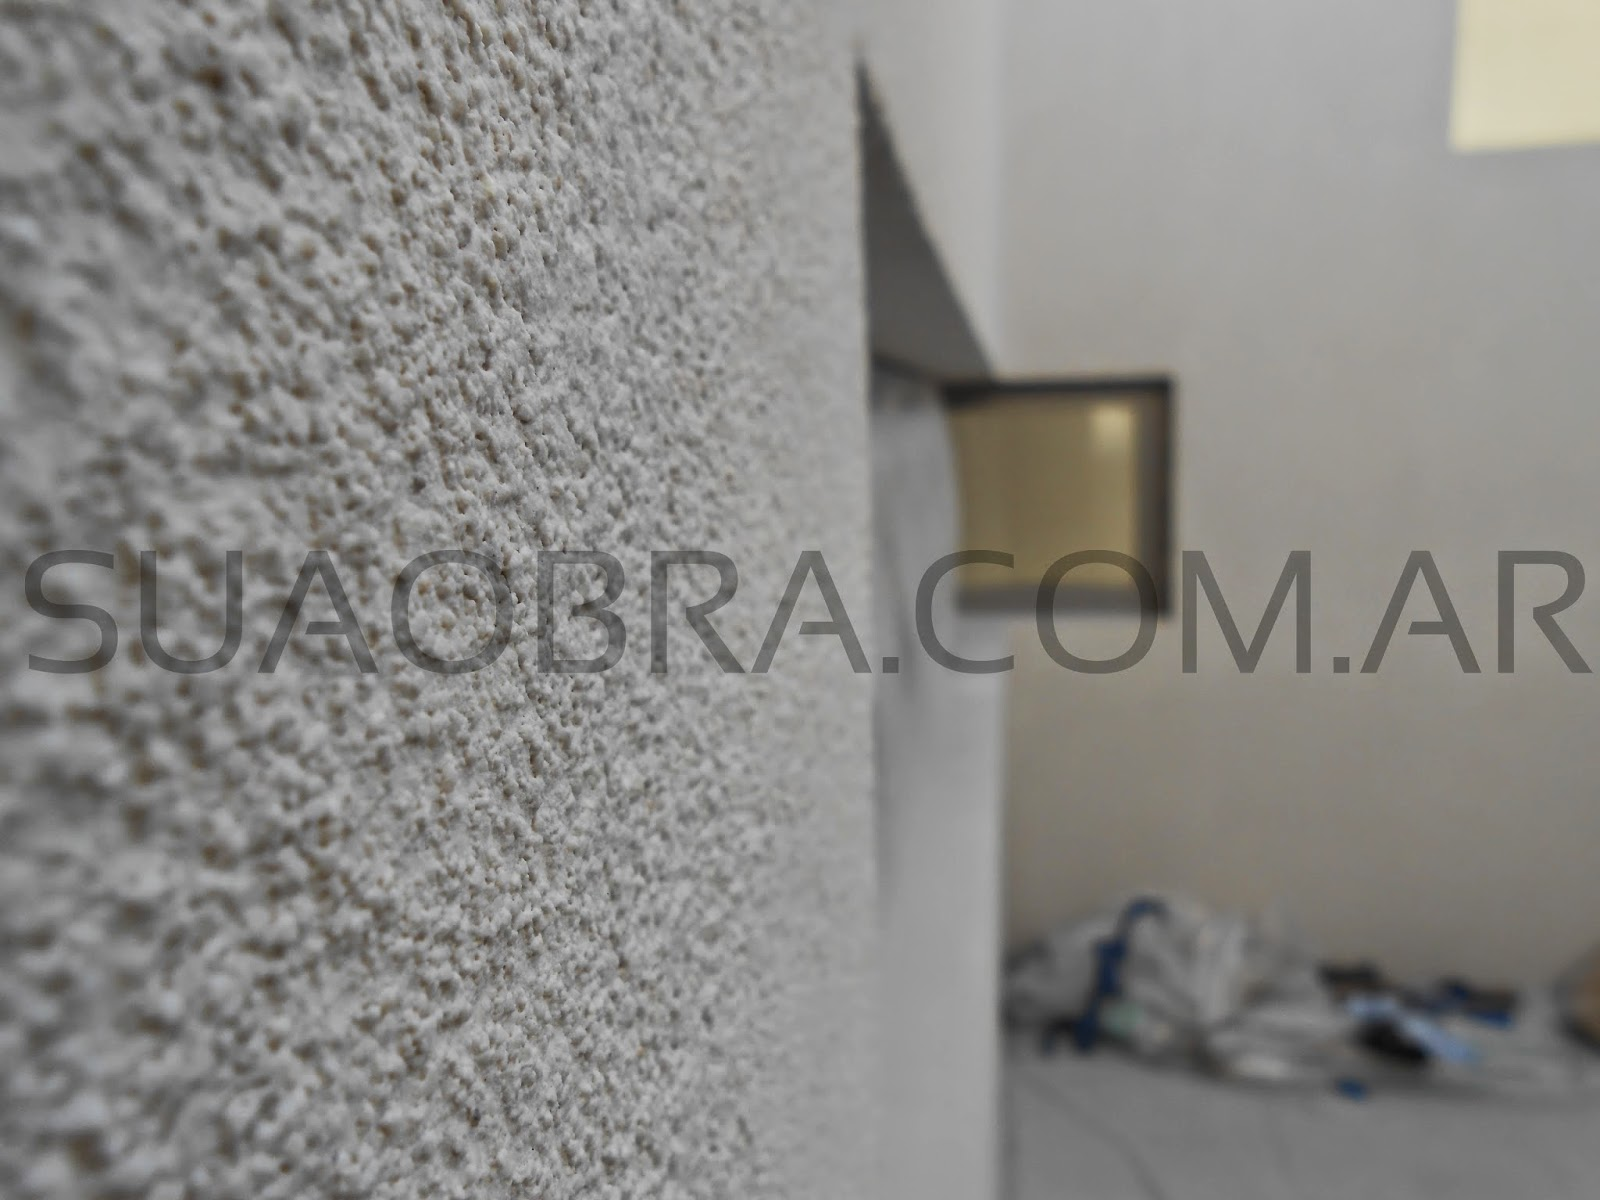 Suaobra revestimientos tel 4589 7878 cel 15 3553 5720 for Revestimiento plastico para paredes